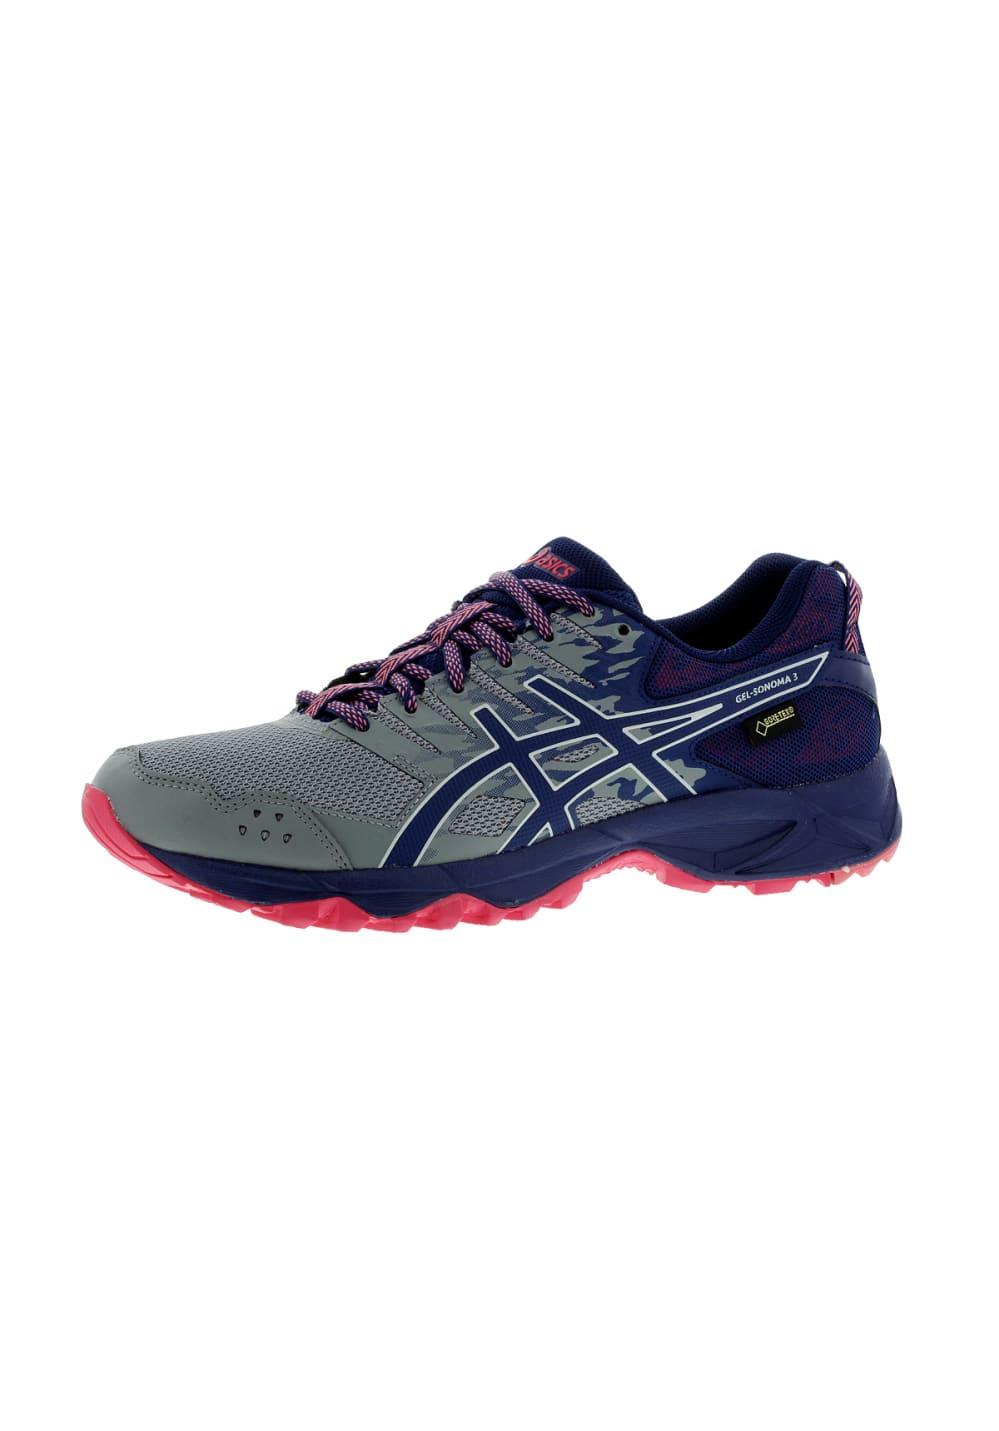 Pour Gel 3 Sonoma Femme Asics Gris G Tx Chaussures Running PukXZi